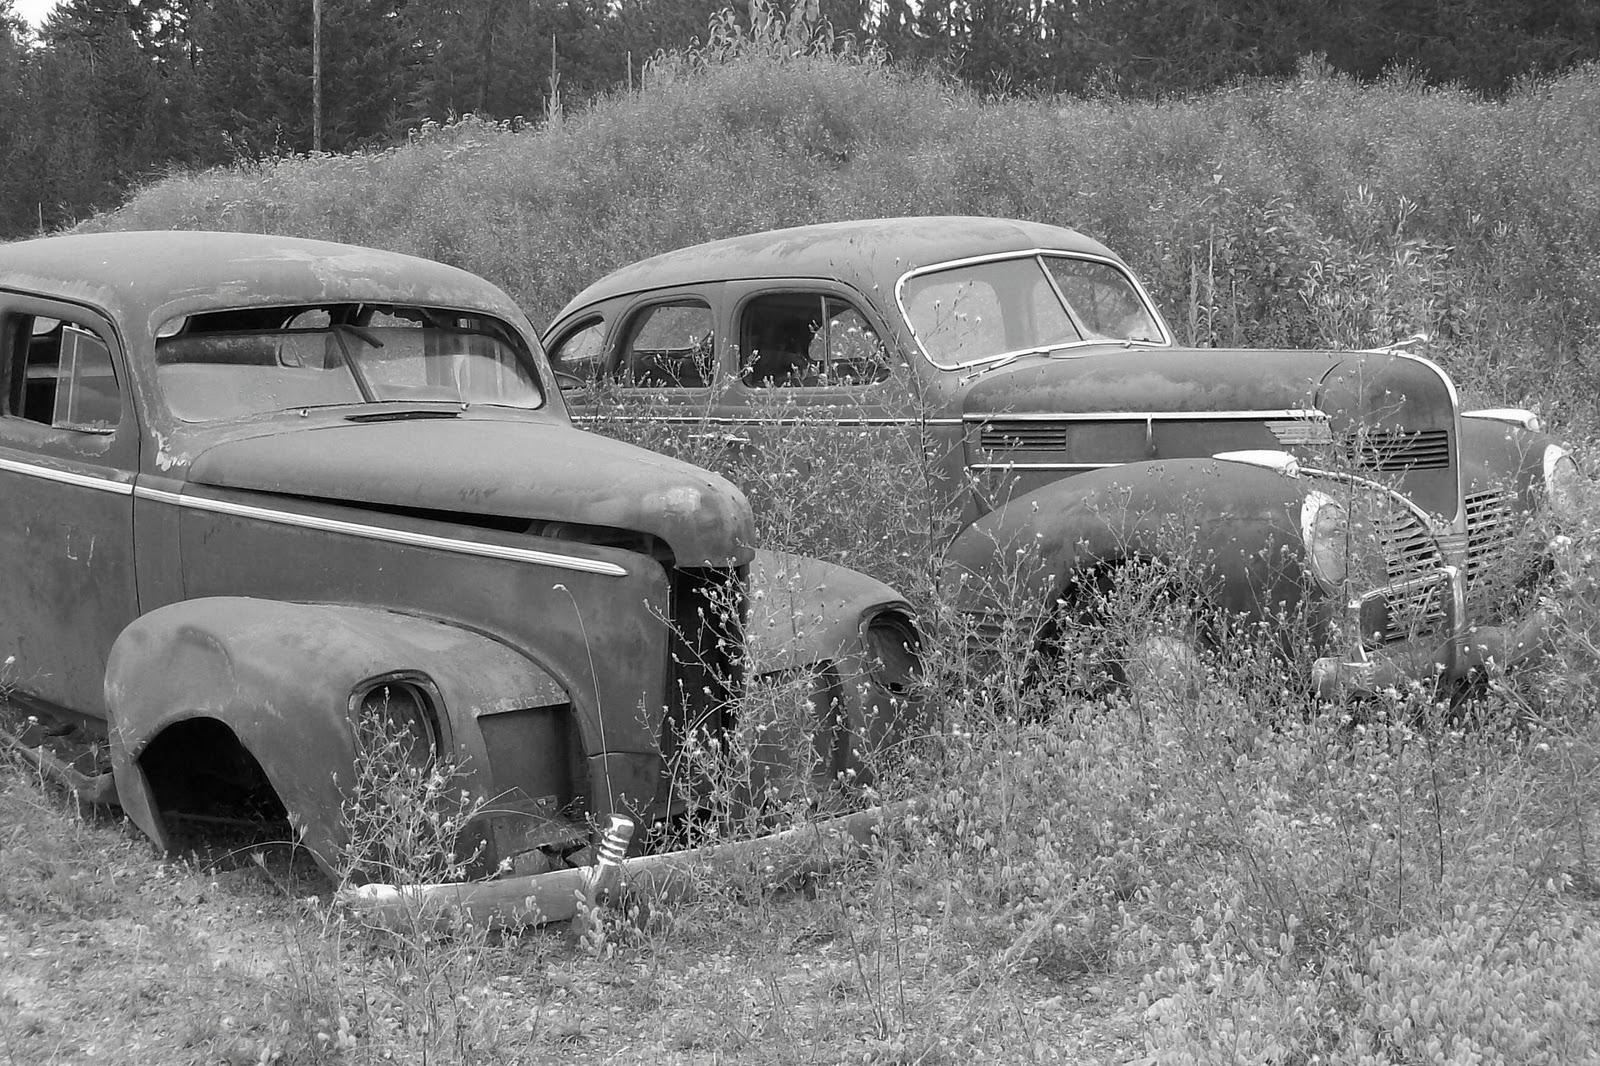 Junk Addiction: Rusty Fenders